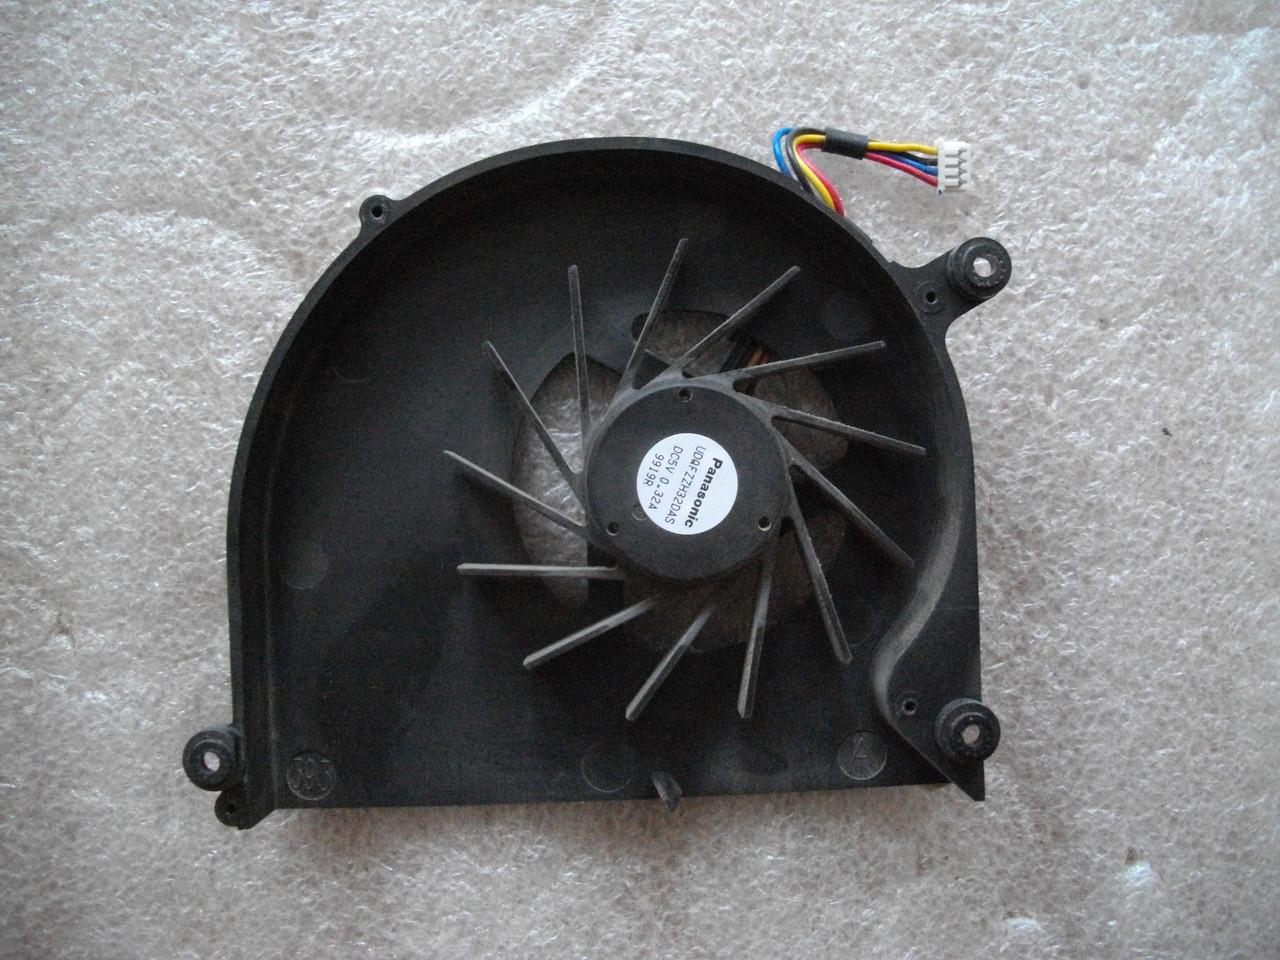 Вентилятор UDQFZZH32DAS Asus K40AB, K40 бу